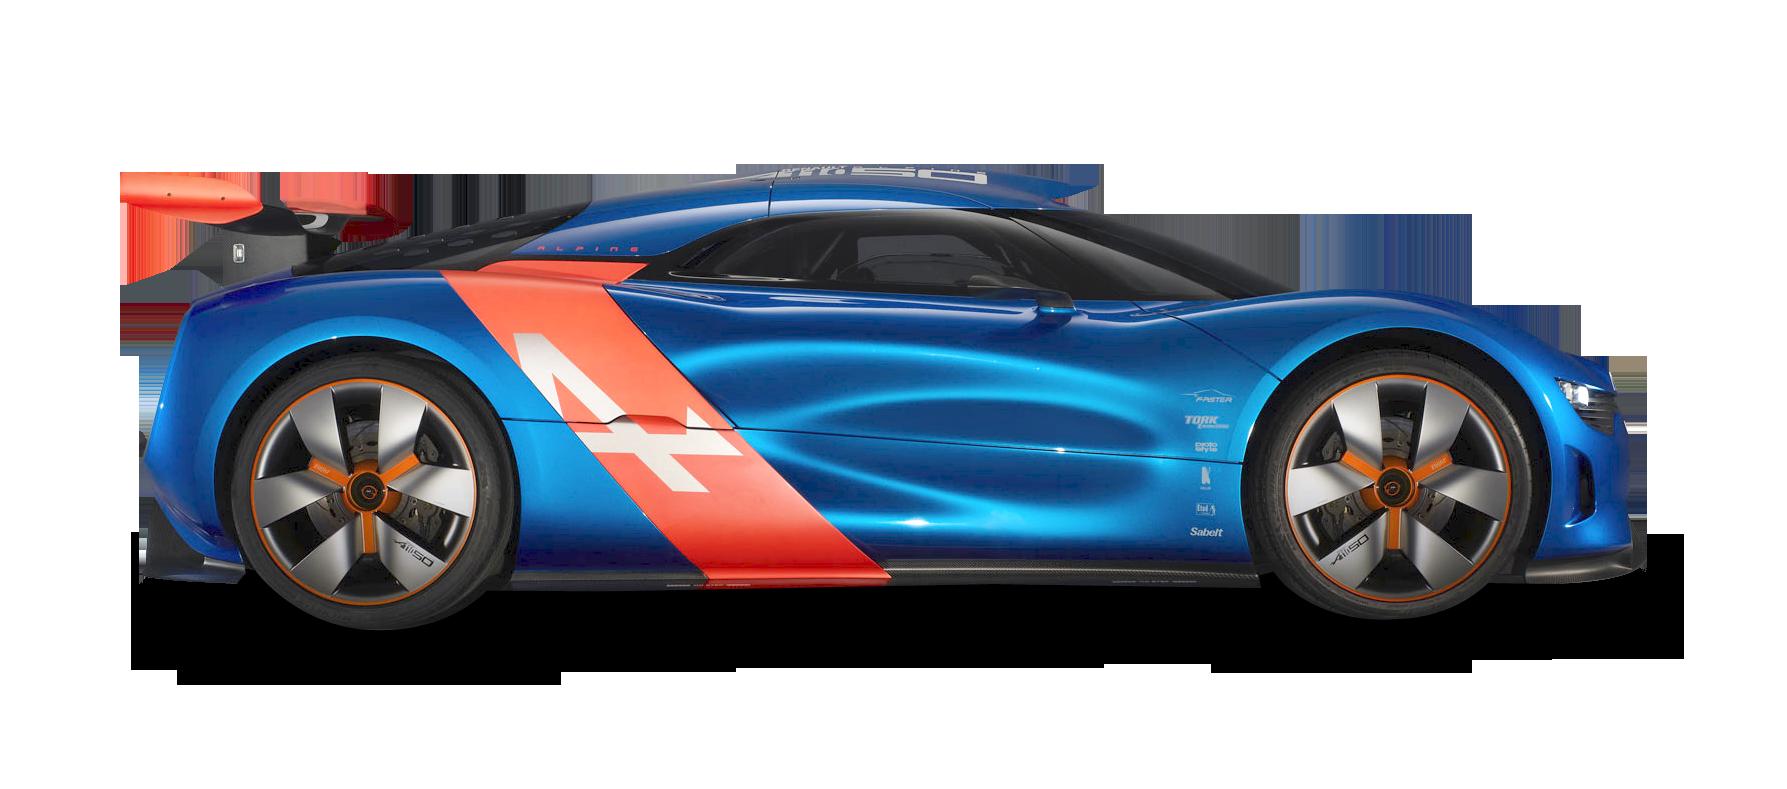 Renault Alpine Car PNG Image